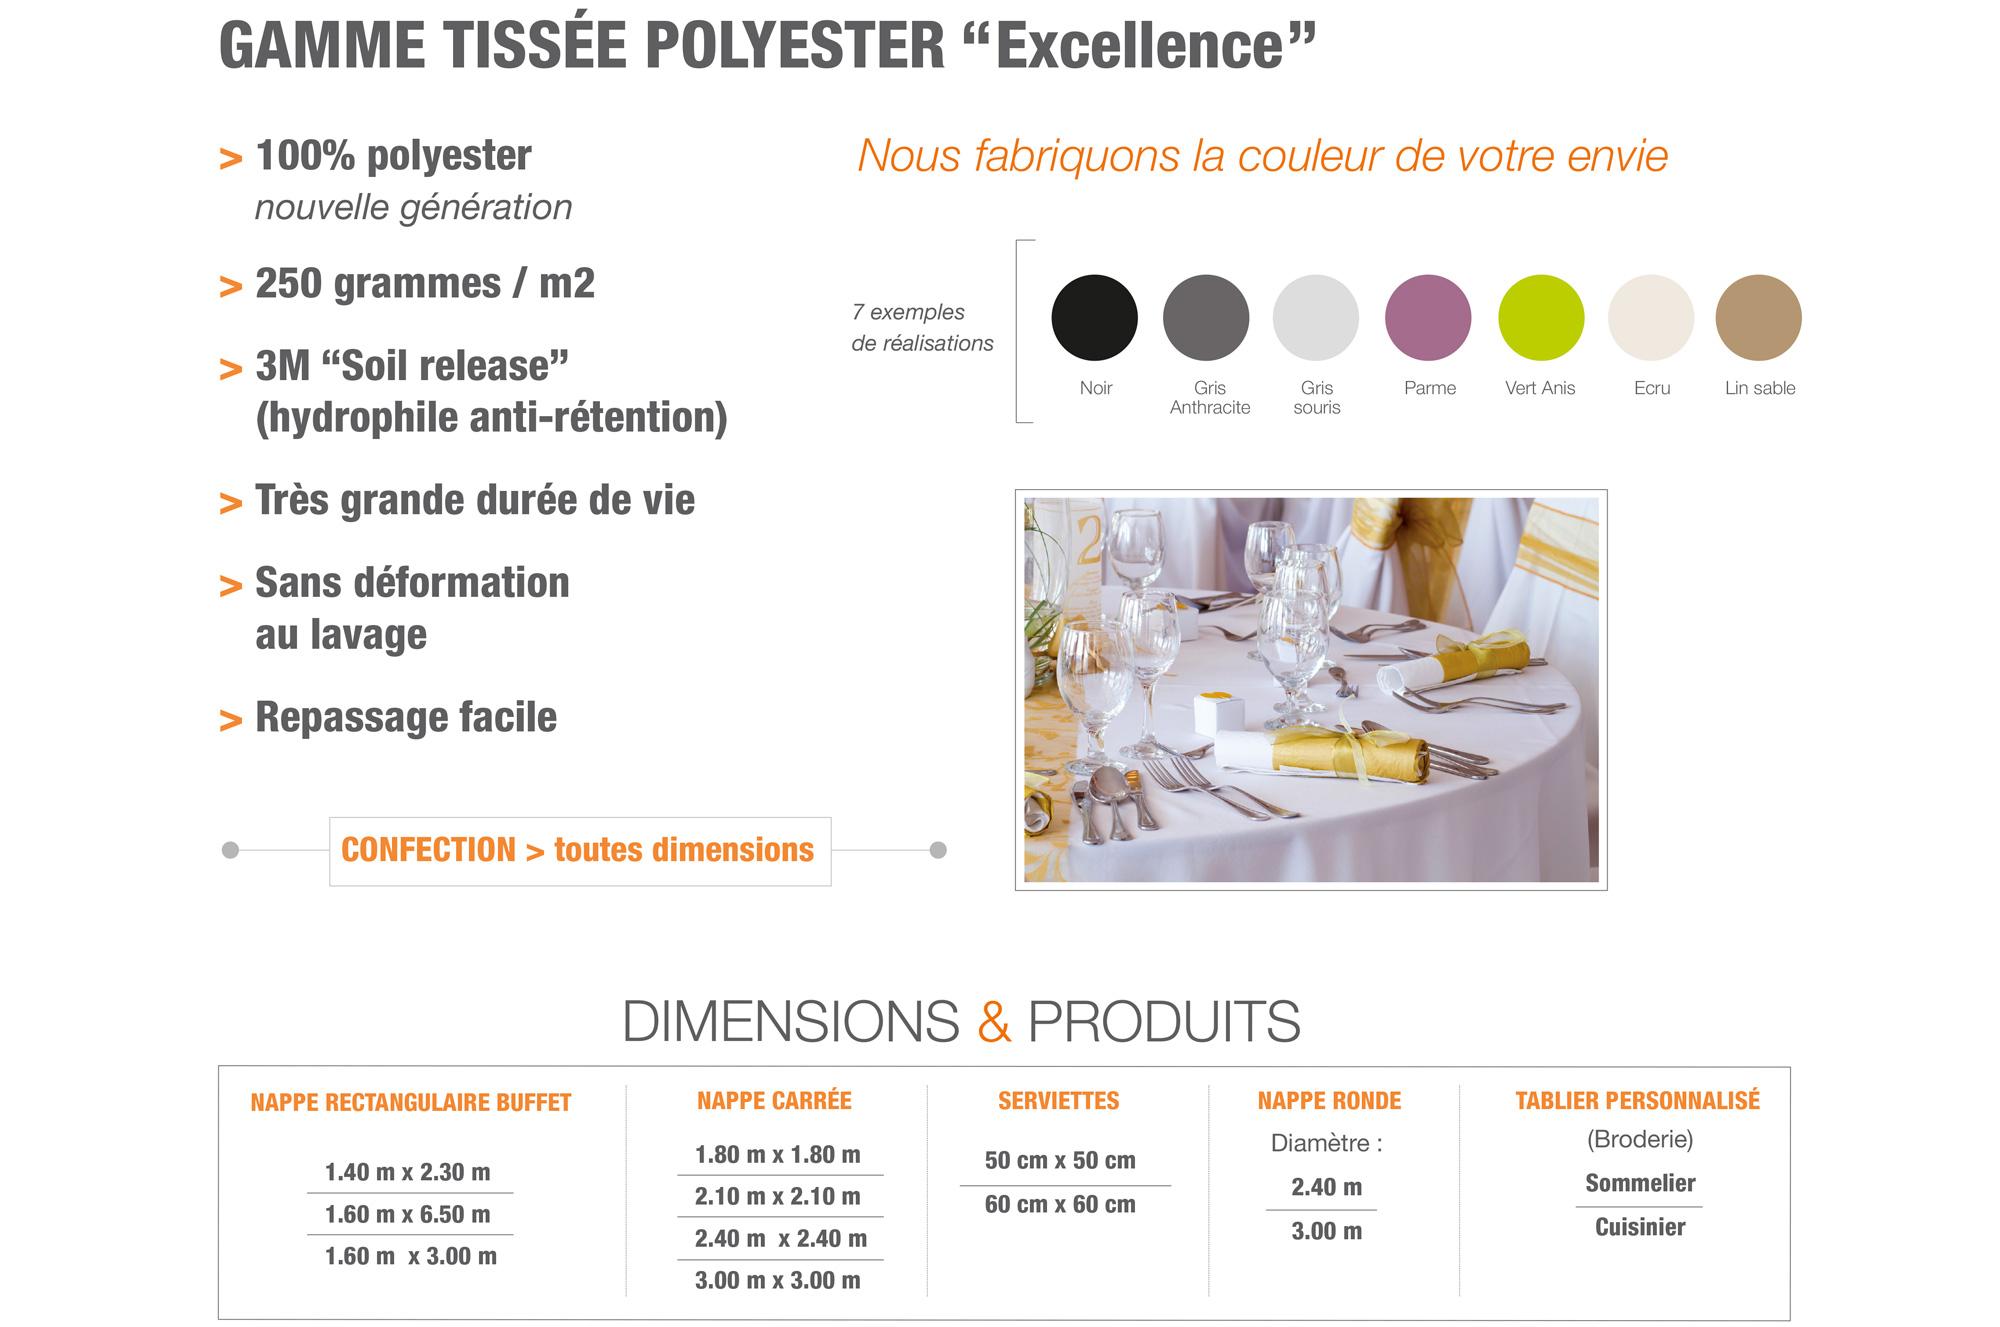 ATT nappes - Gamme  tissée polyester Excellence